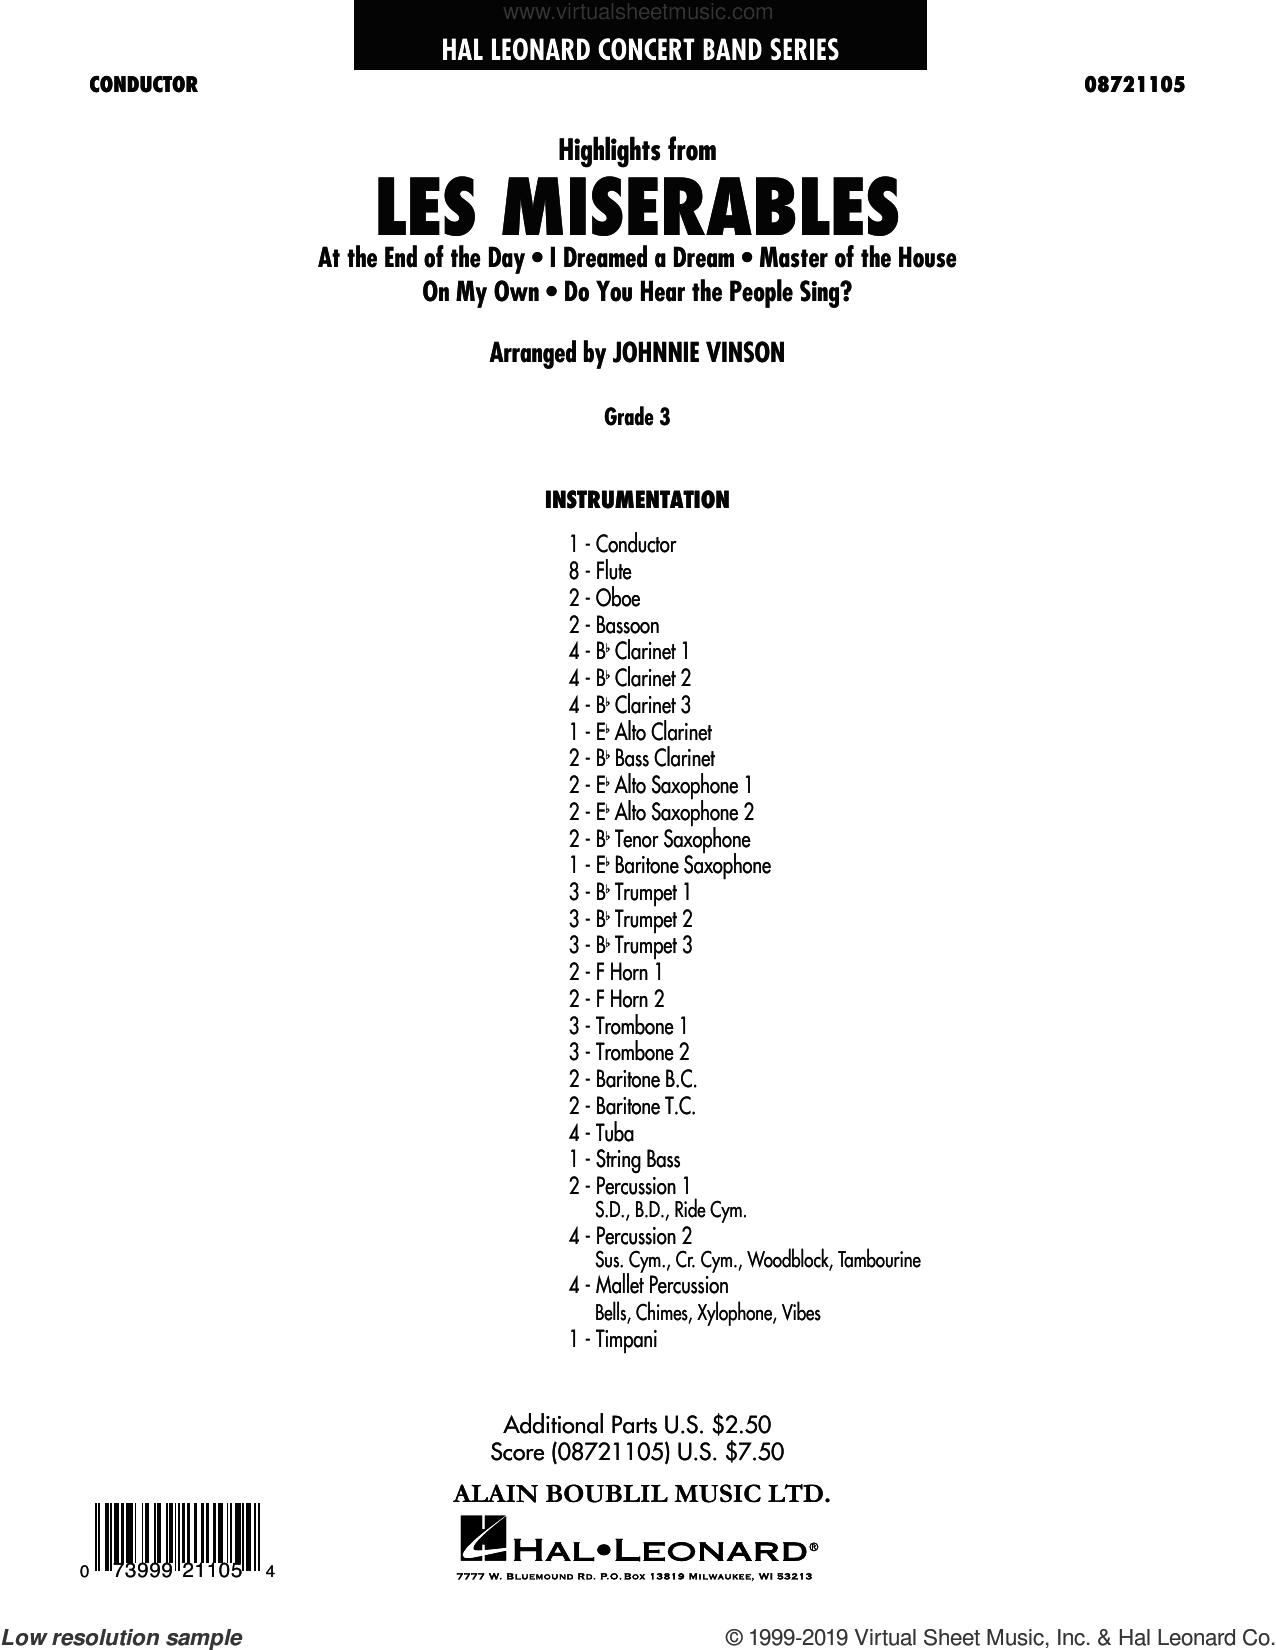 Highlights from Les Miserables (arr. Johnnie Vinson) (complete set of parts) sheet music for concert band by Claude-Michel Schönberg, Alain Boublil, Herbert Kretzmer, Jean-Marc Natel and Johnnie Vinson, intermediate skill level